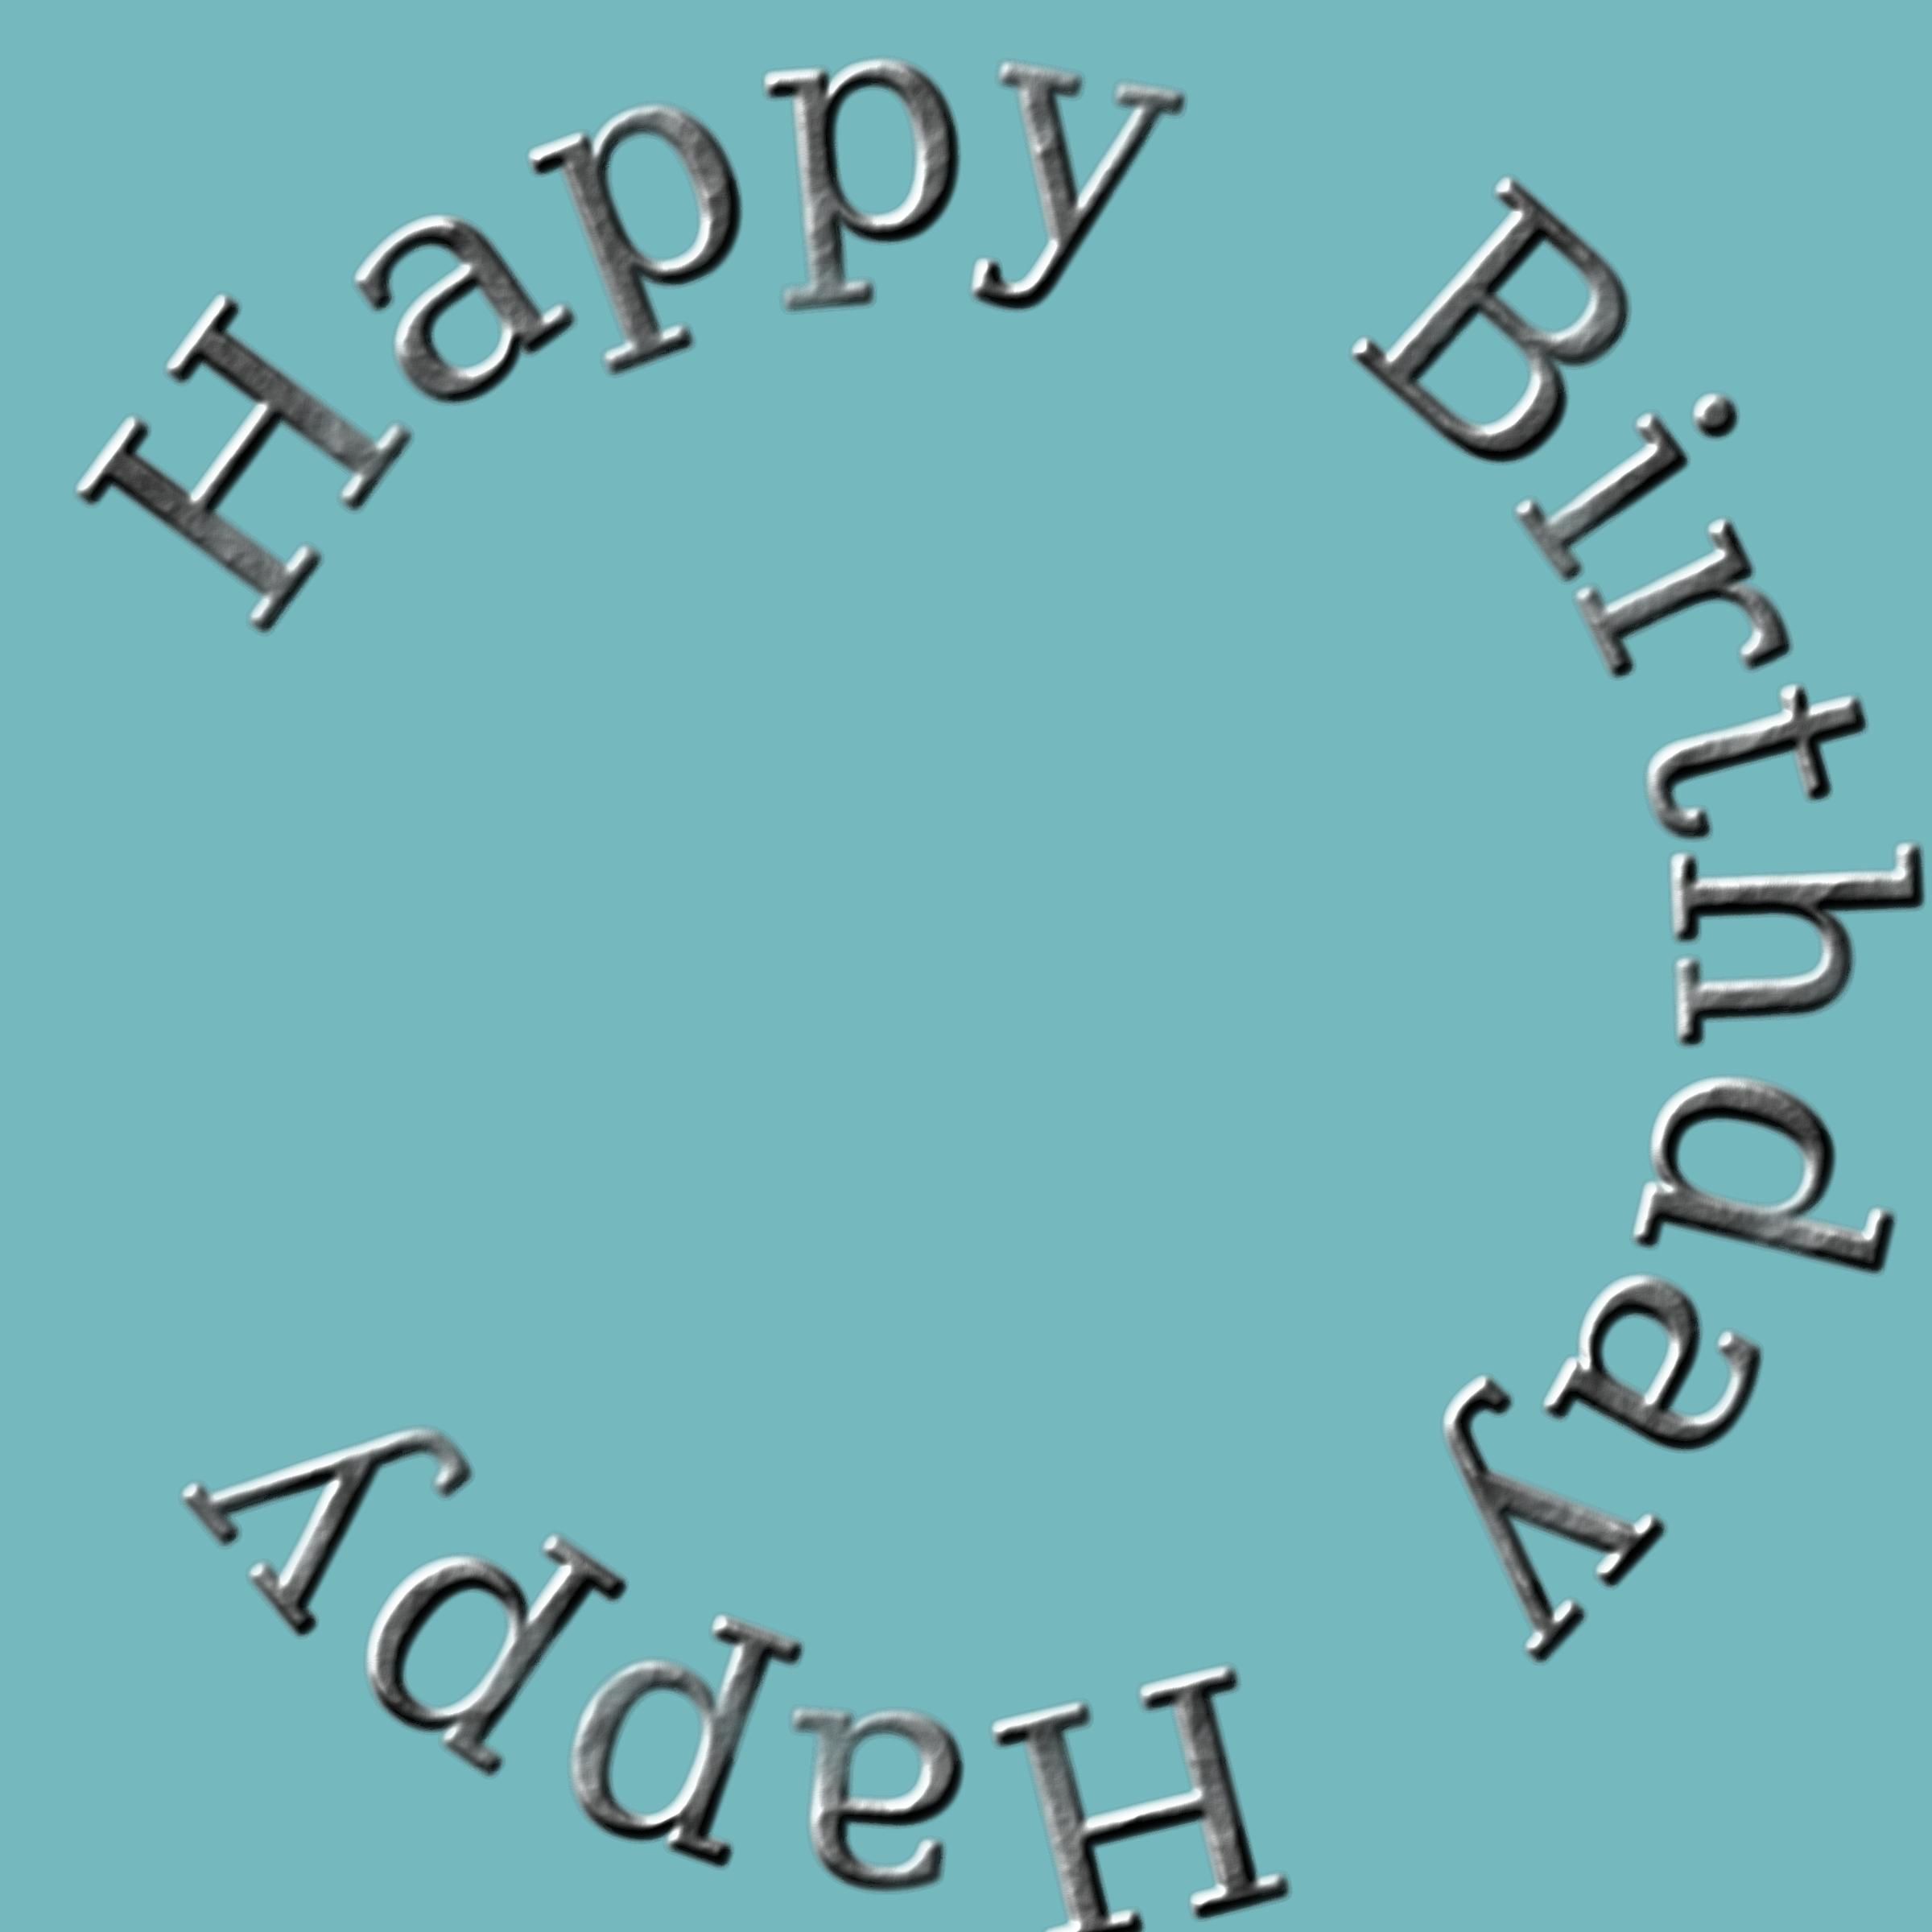 Big image png. Circle clipart happy birthday